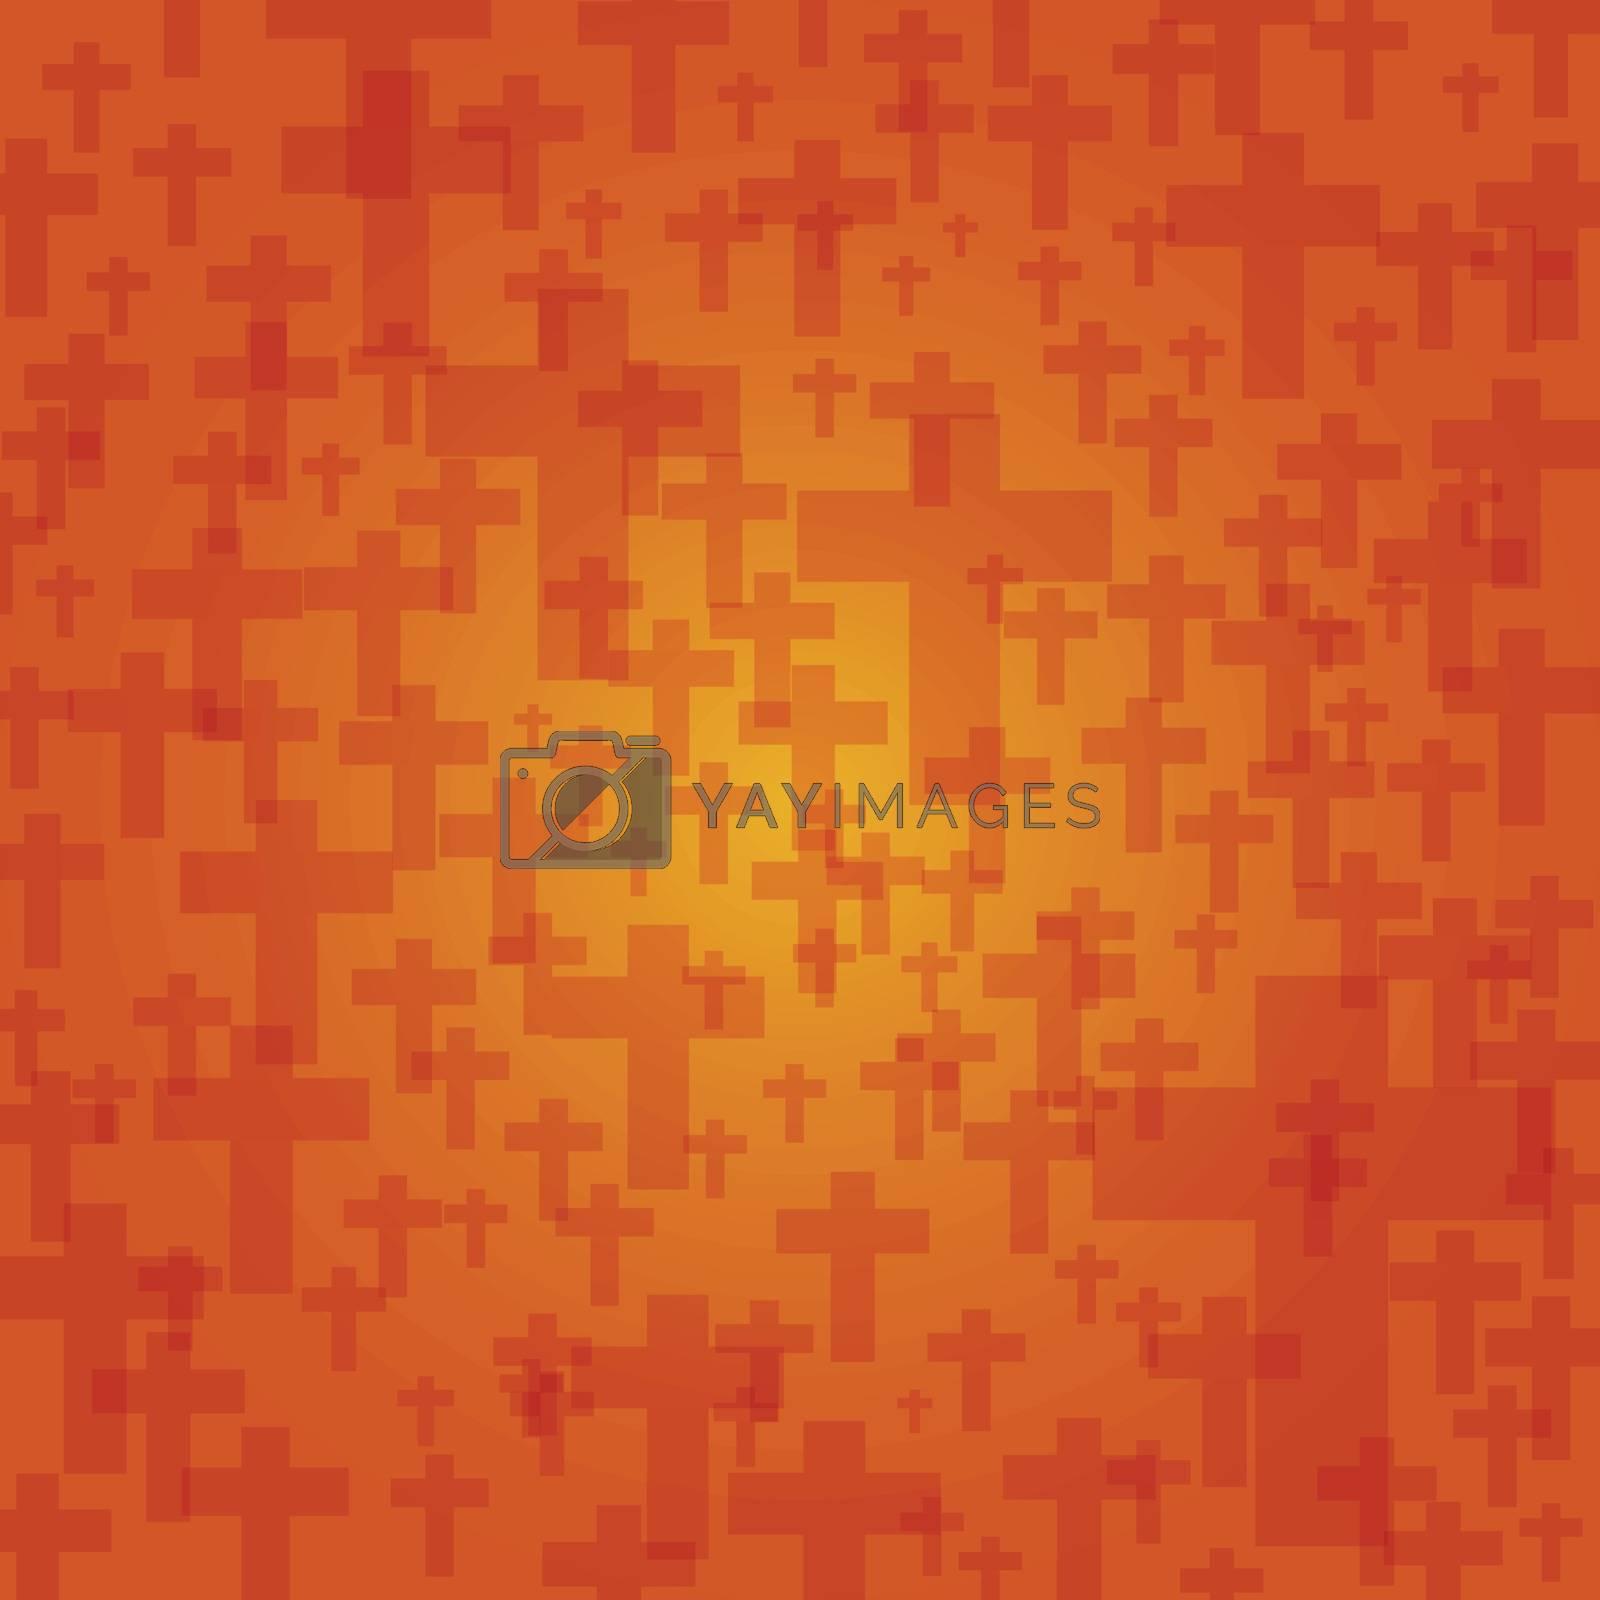 background dark orange color halloween with crucifix pattern texture, vector illustration